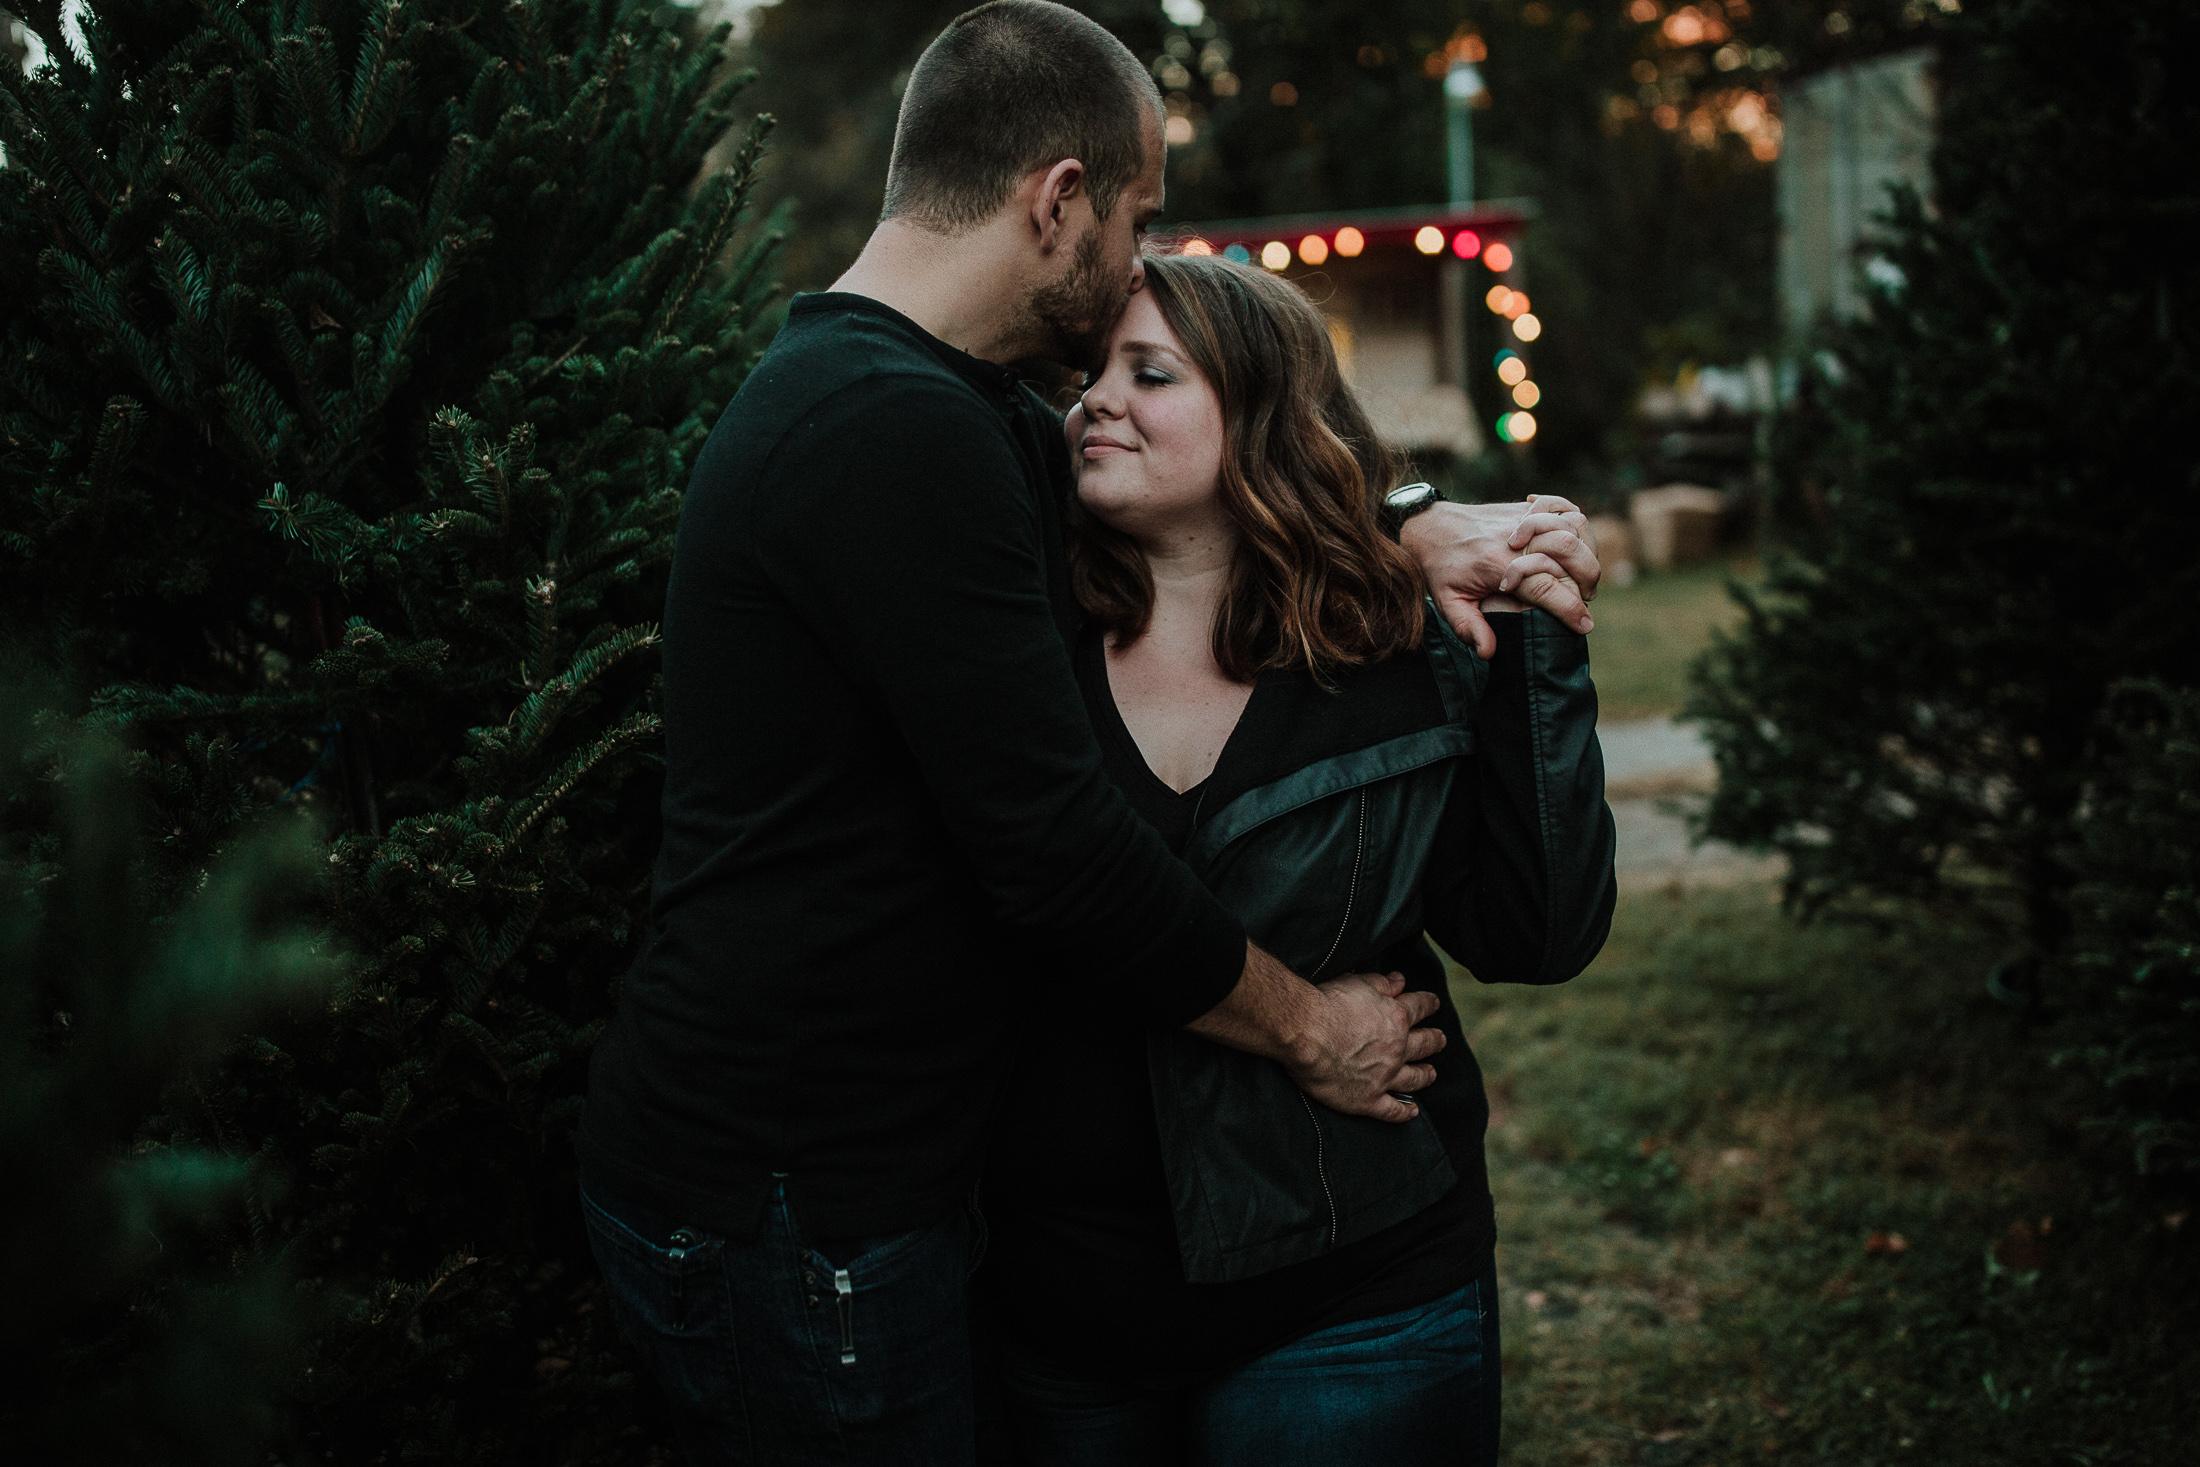 couples-10.jpg